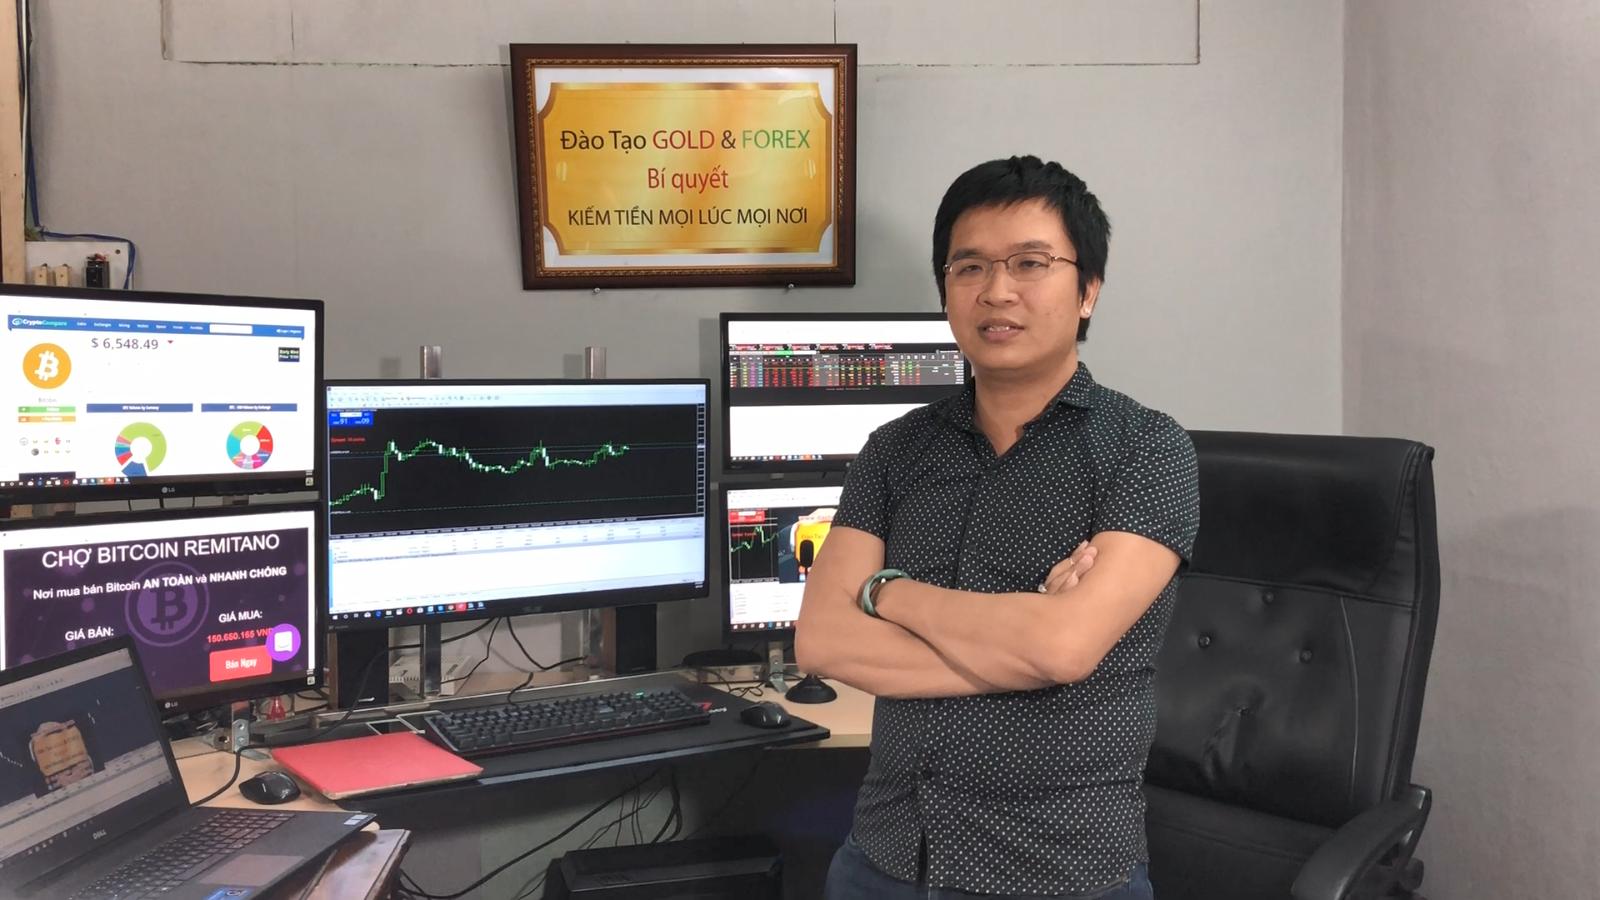 Trần Quốc Minh